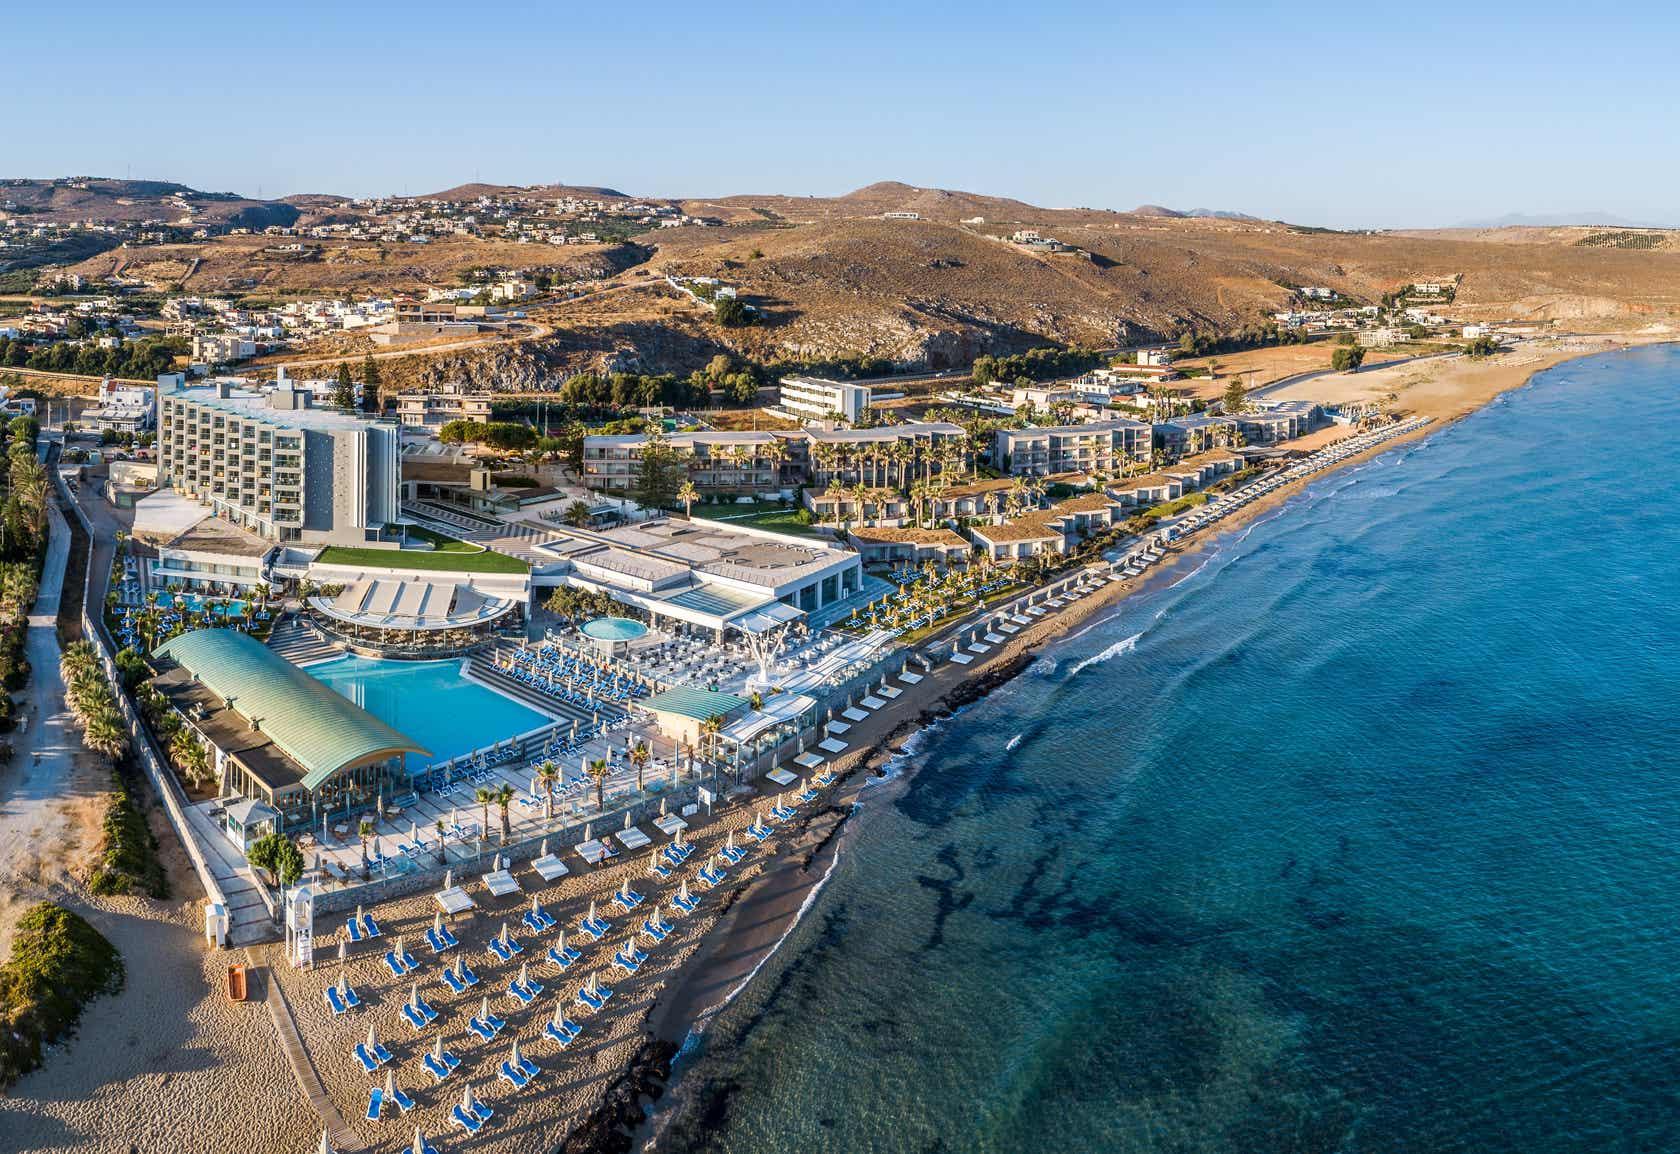 Arina Beach Hotel & Bungalows